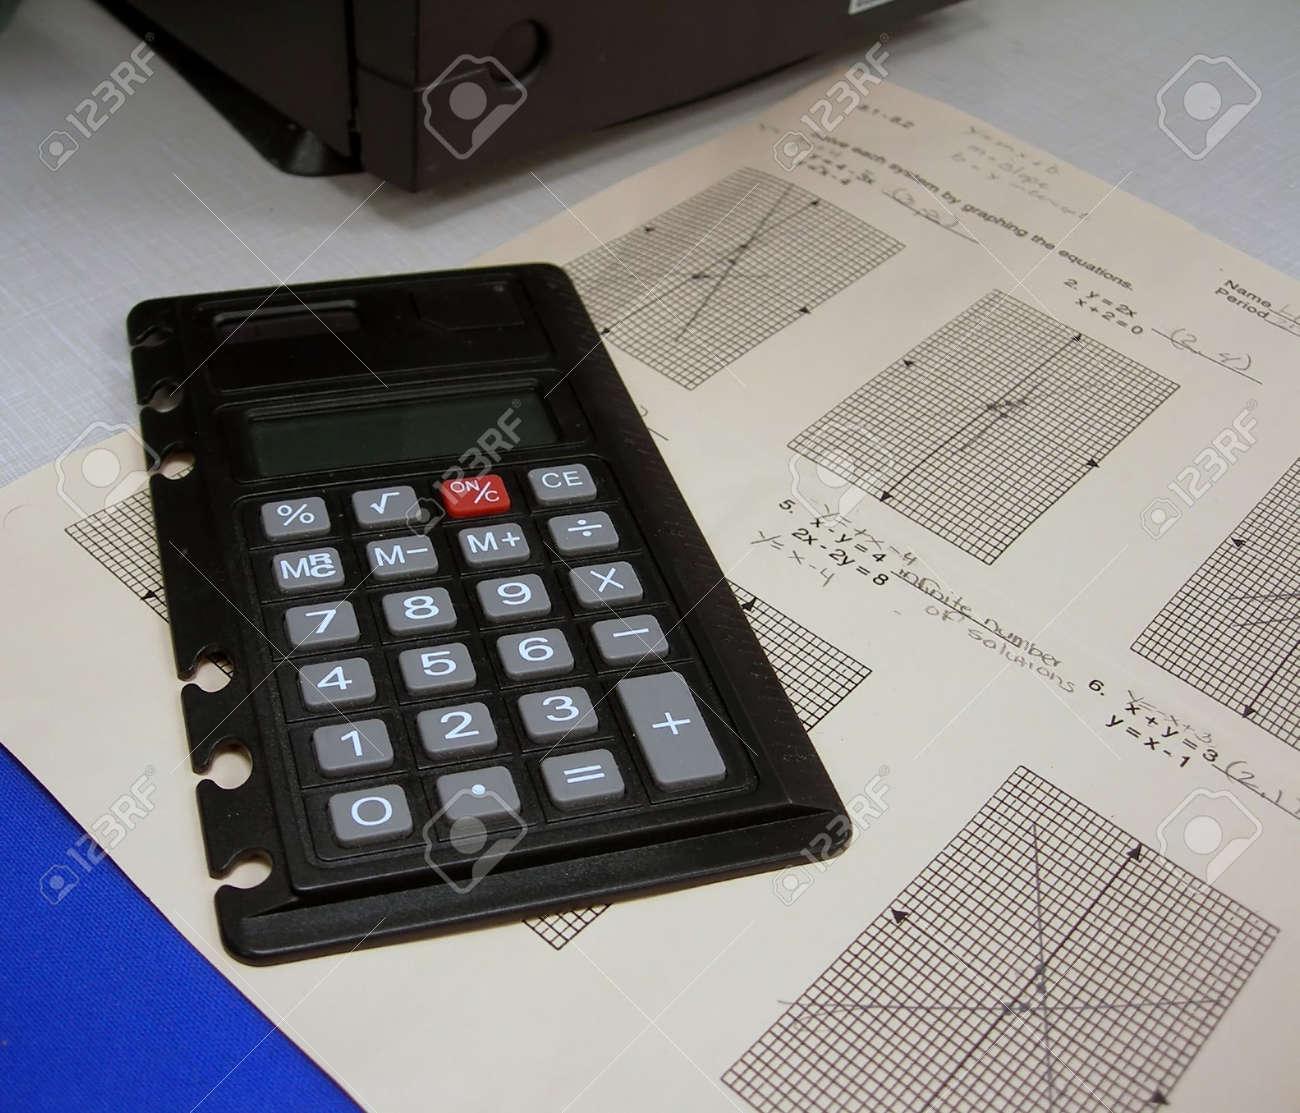 Homework calculator: YHomework - Math Solver on the App